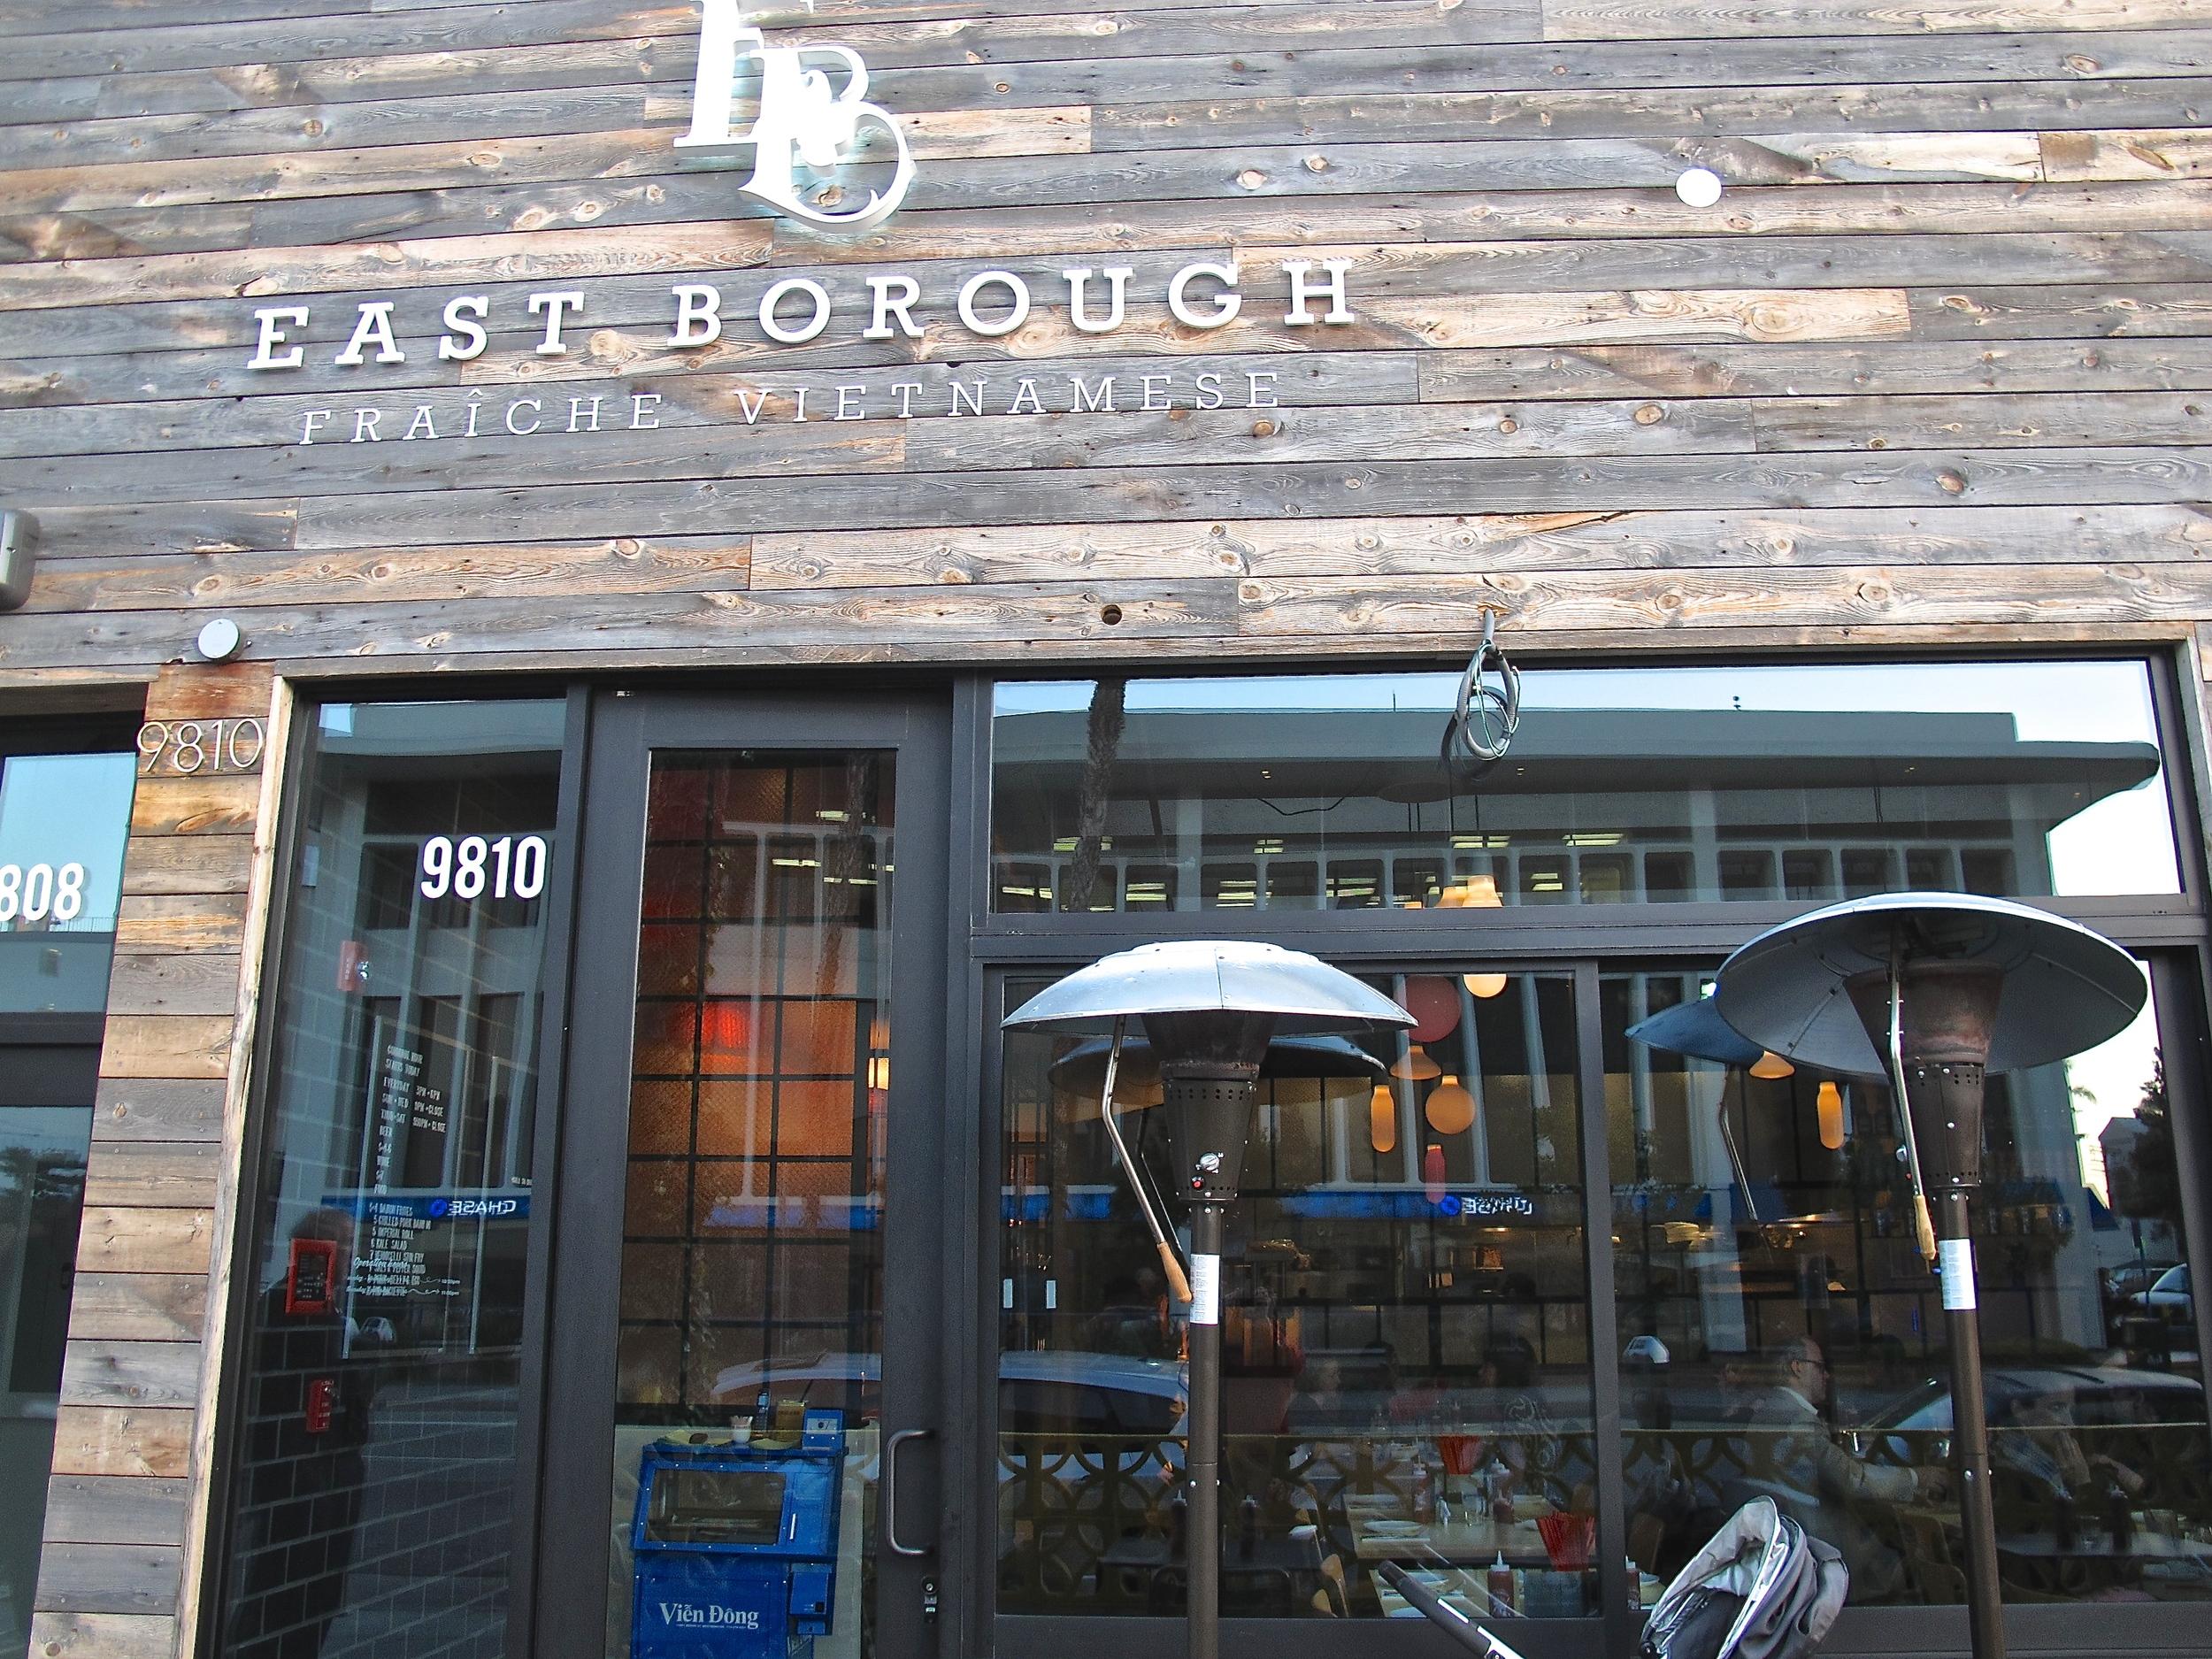 East Borough